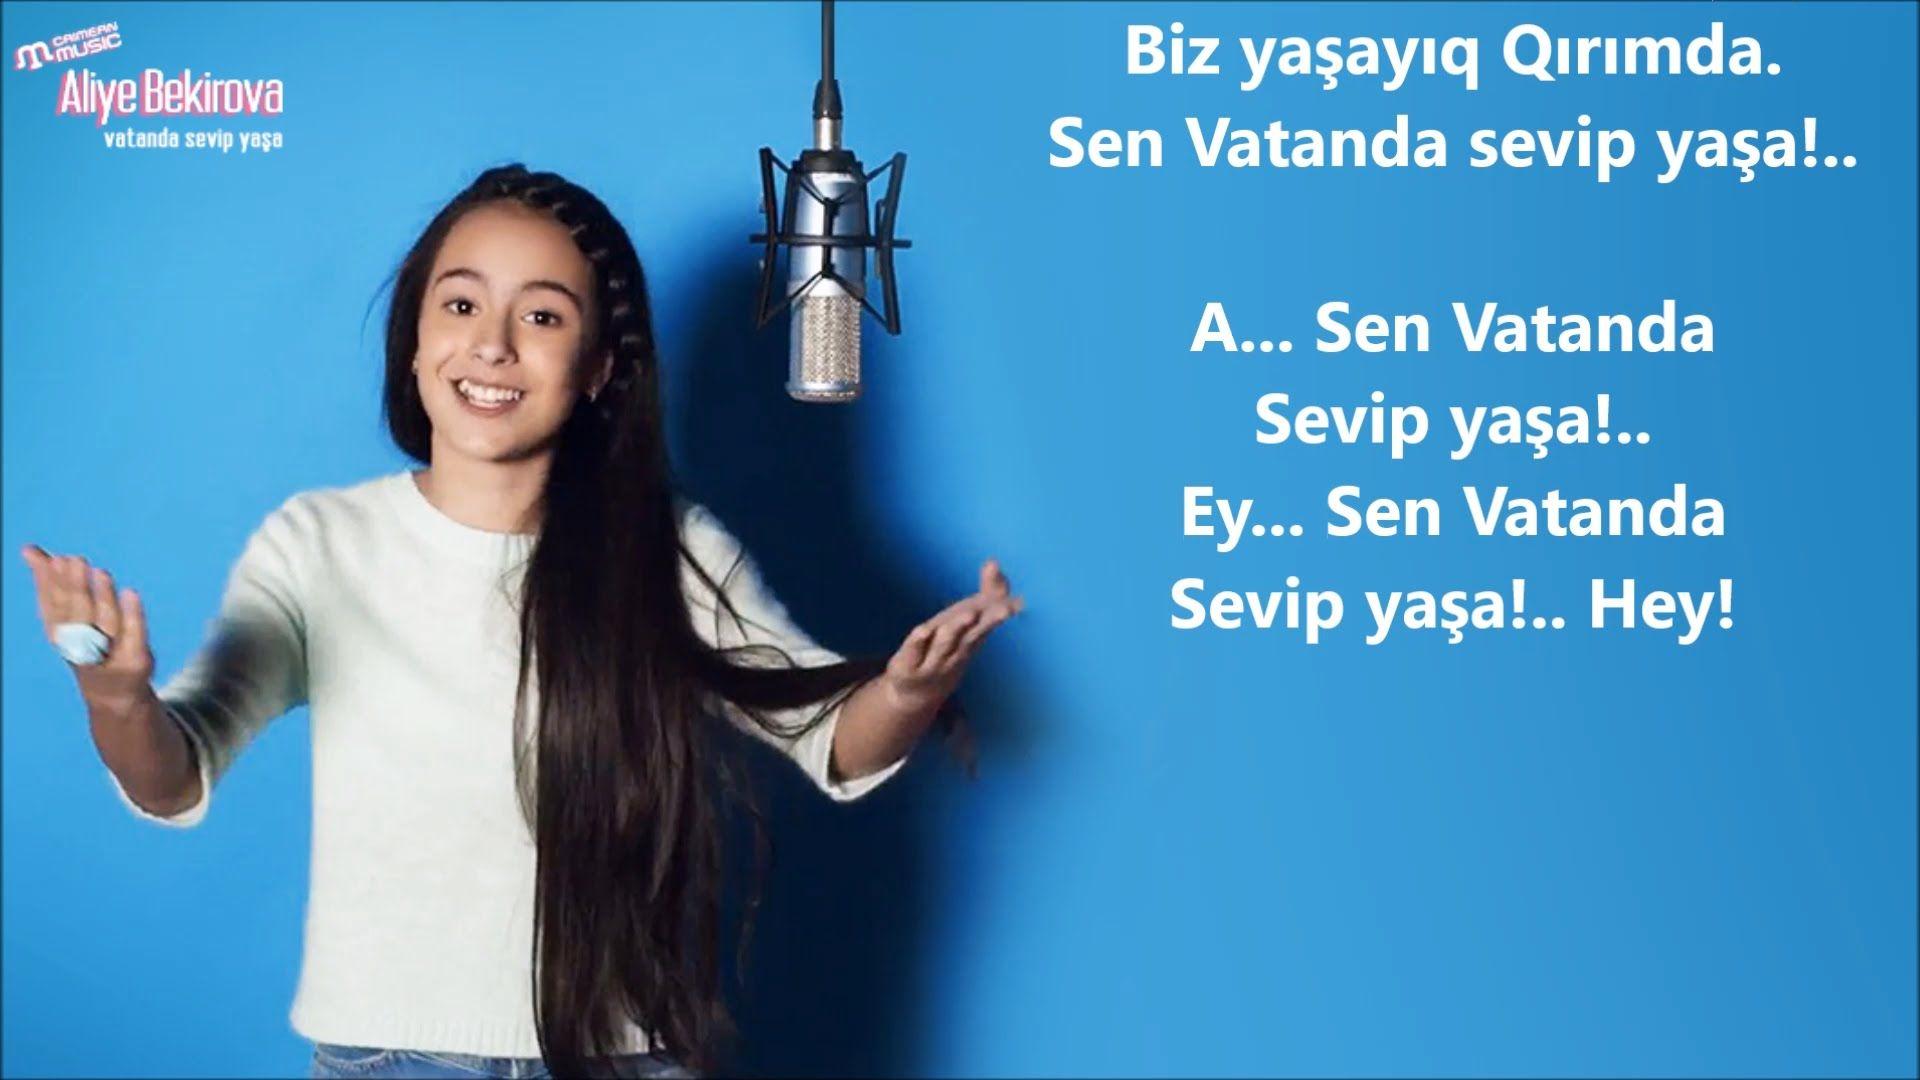 Aliye Bekirova Vatanda Sevip Yasa Lyrics Muzik Youtube Yastiklar